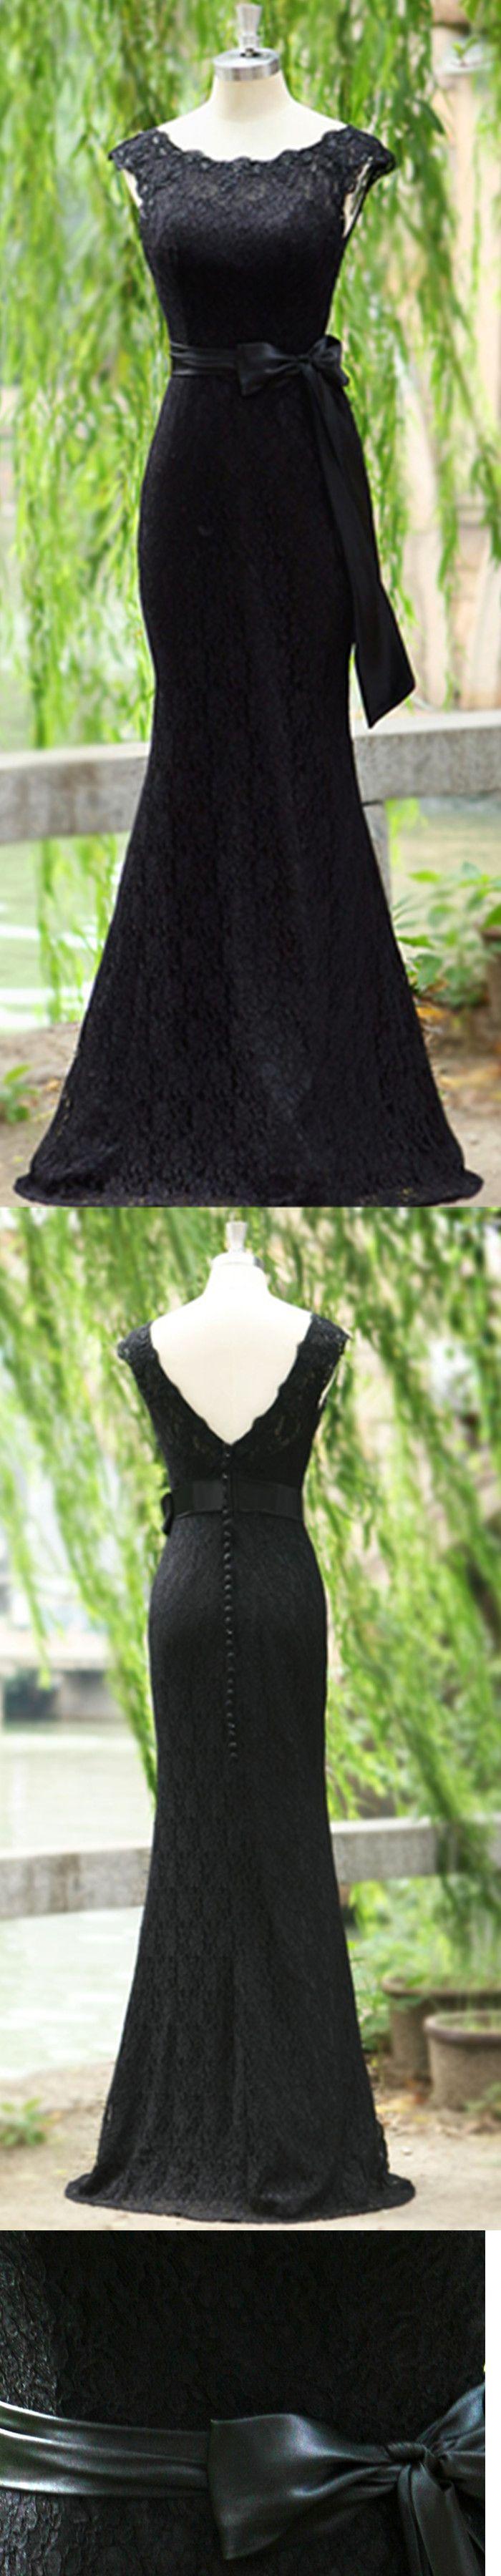 Exquisite mermaid black lace evening dress scoop neckline ribbon